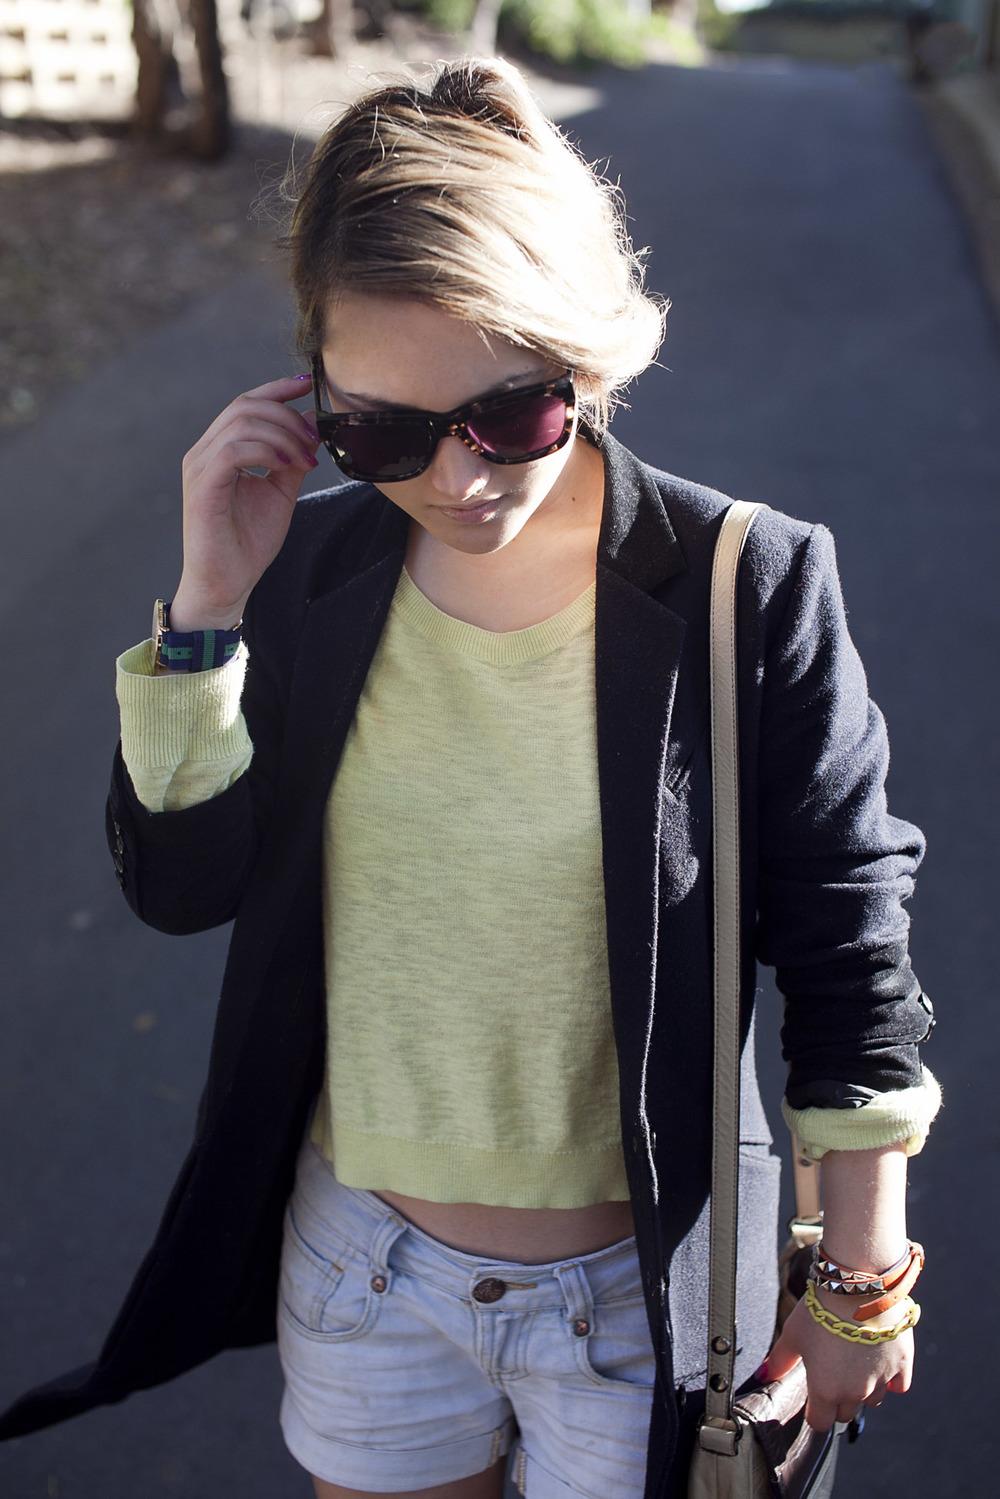 Daniel Wellington watch (gift) | Ksubi 'ara' sunglasses (gift)